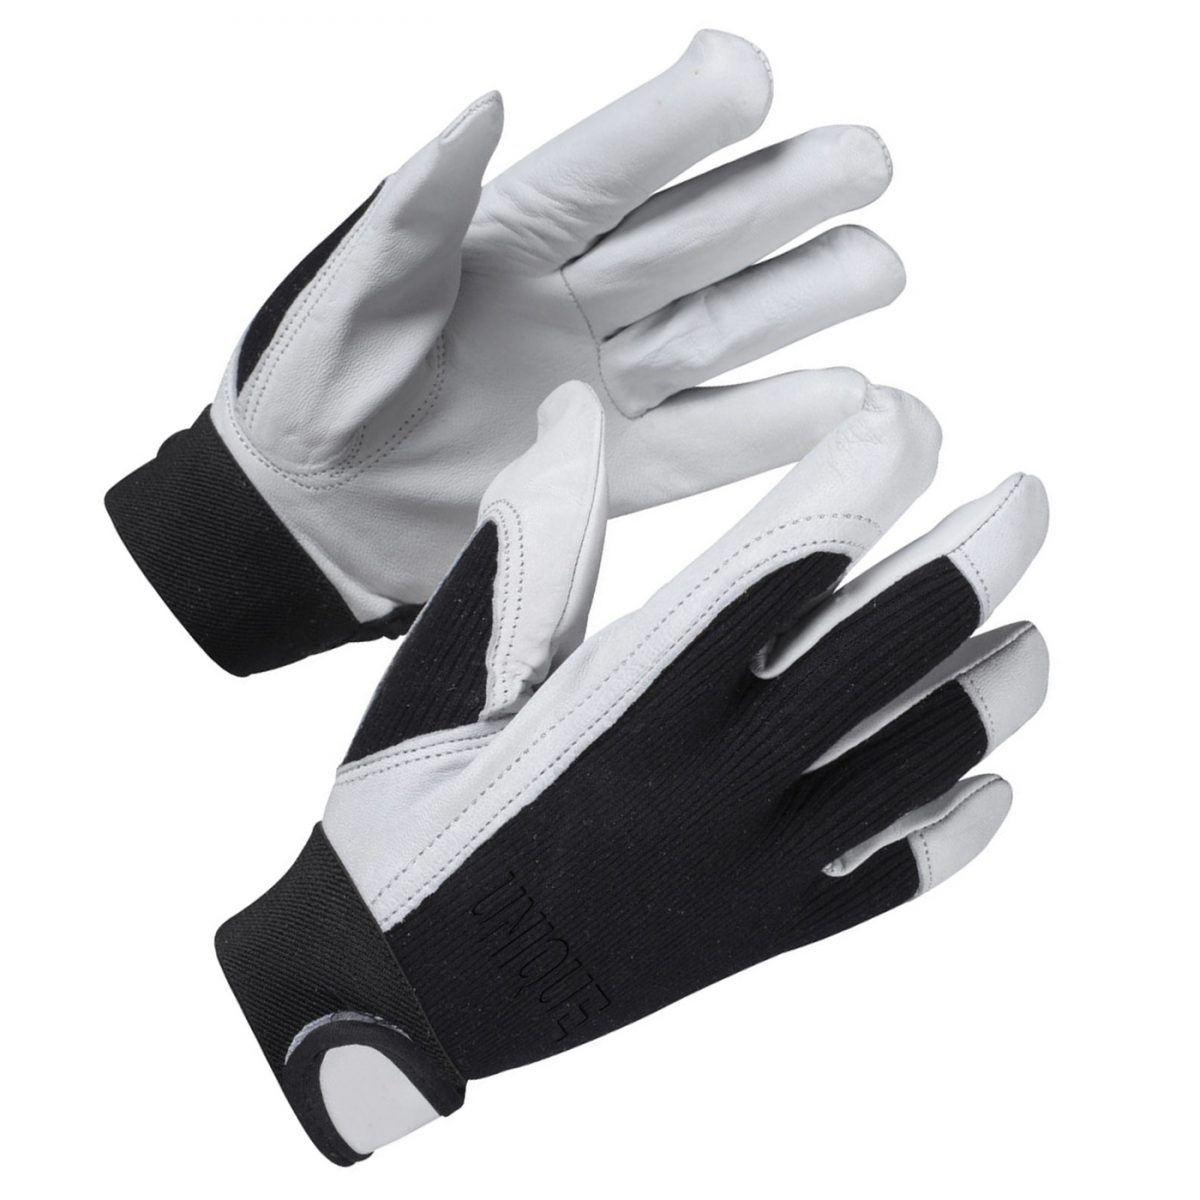 Goat Skin Leather Glove